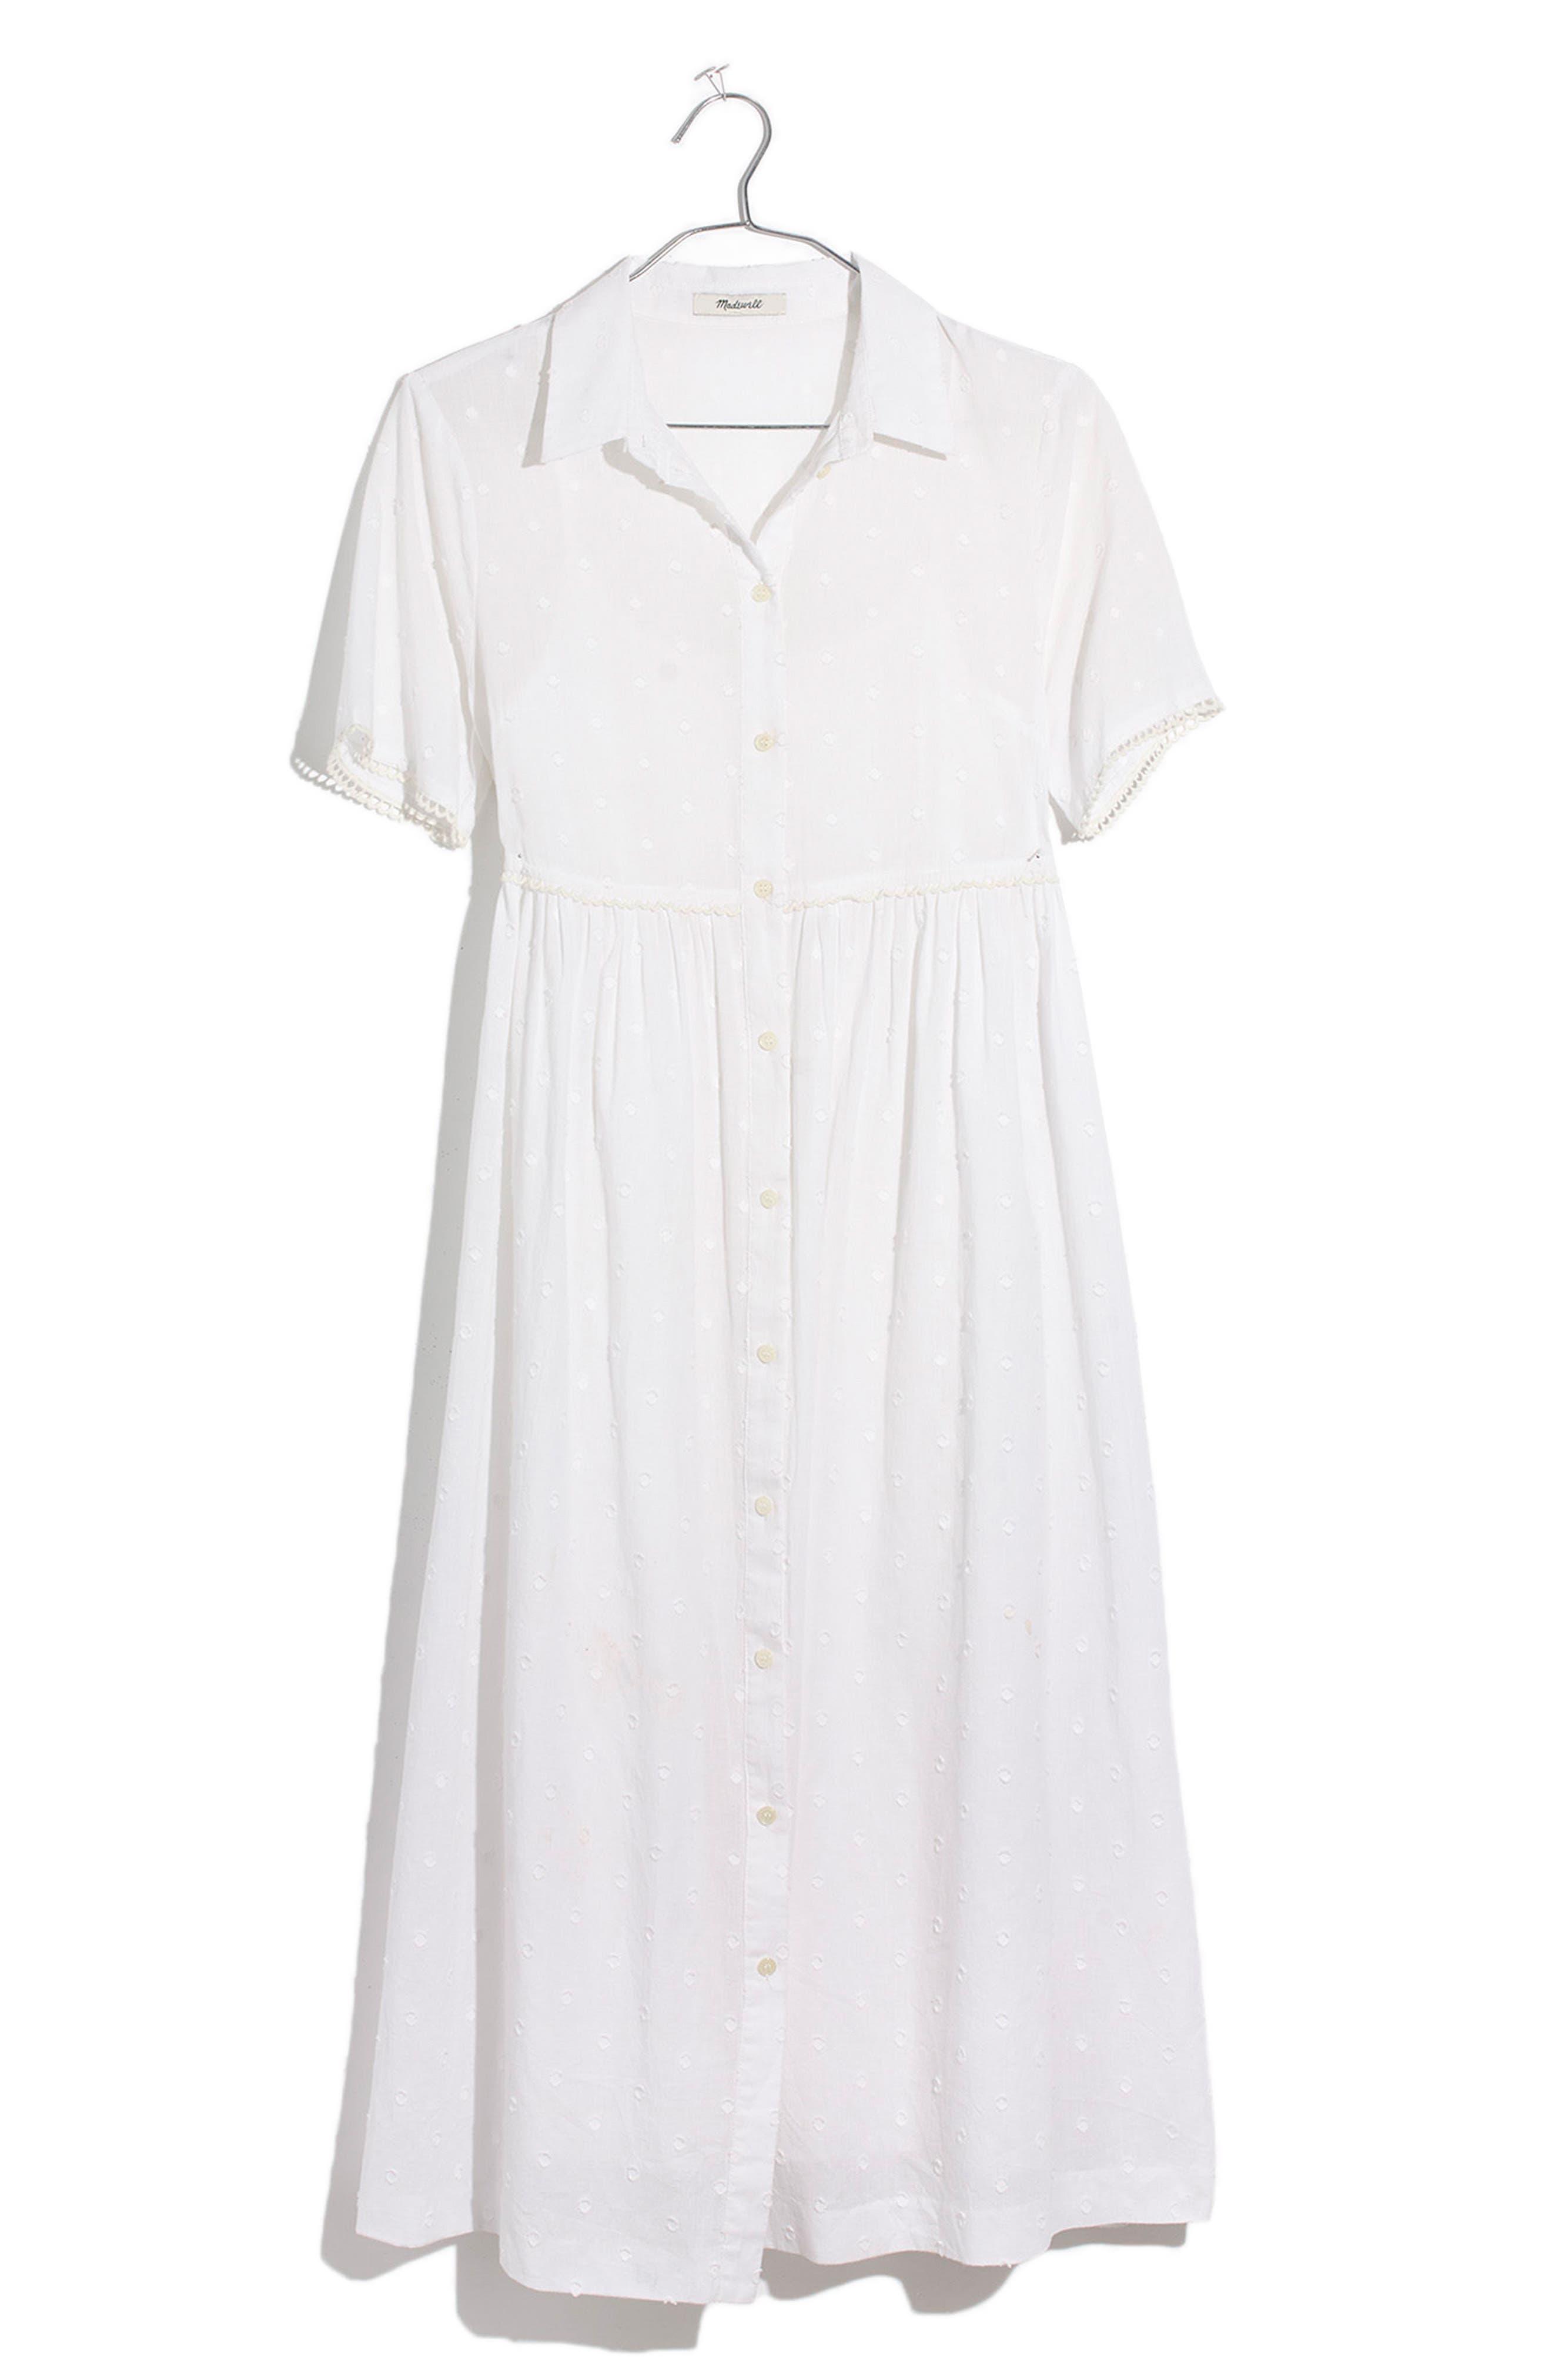 Clipdot Midi Shirtdress,                             Alternate thumbnail 4, color,                             EYELET WHITE